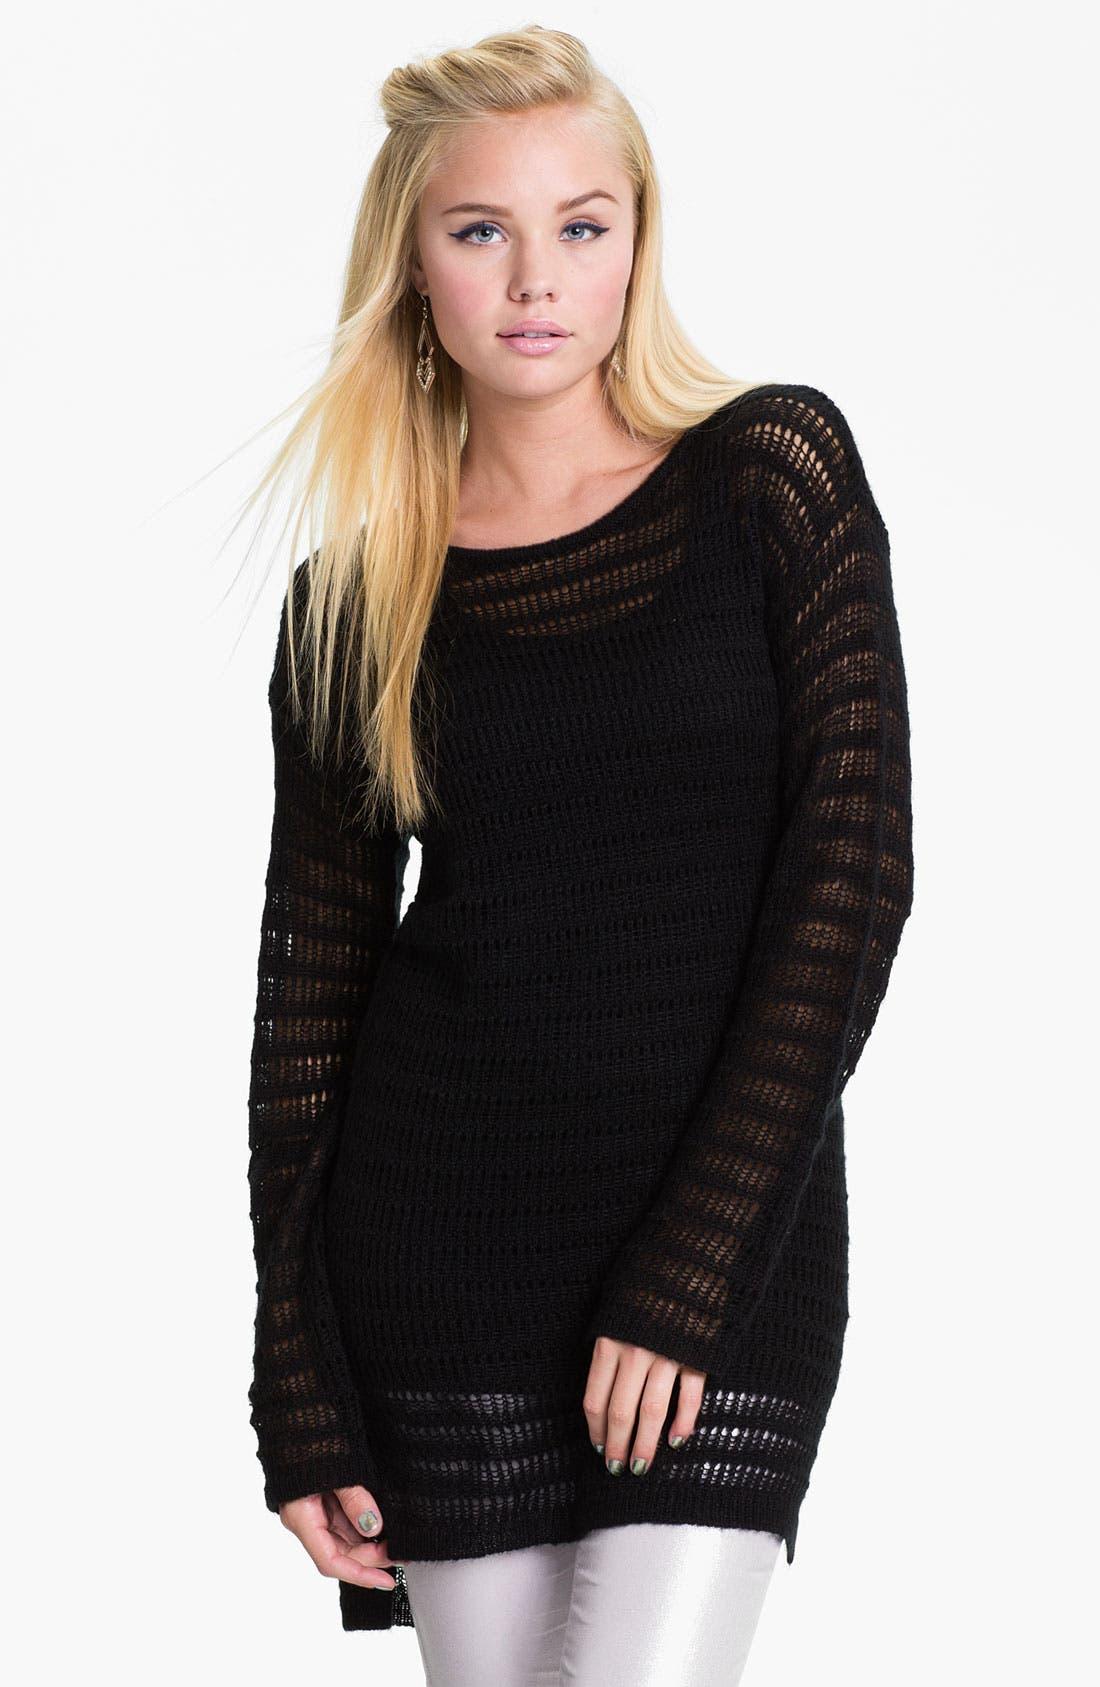 Main Image - Frenchi® 'Drop Needle' Tunic Sweater (Juniors)